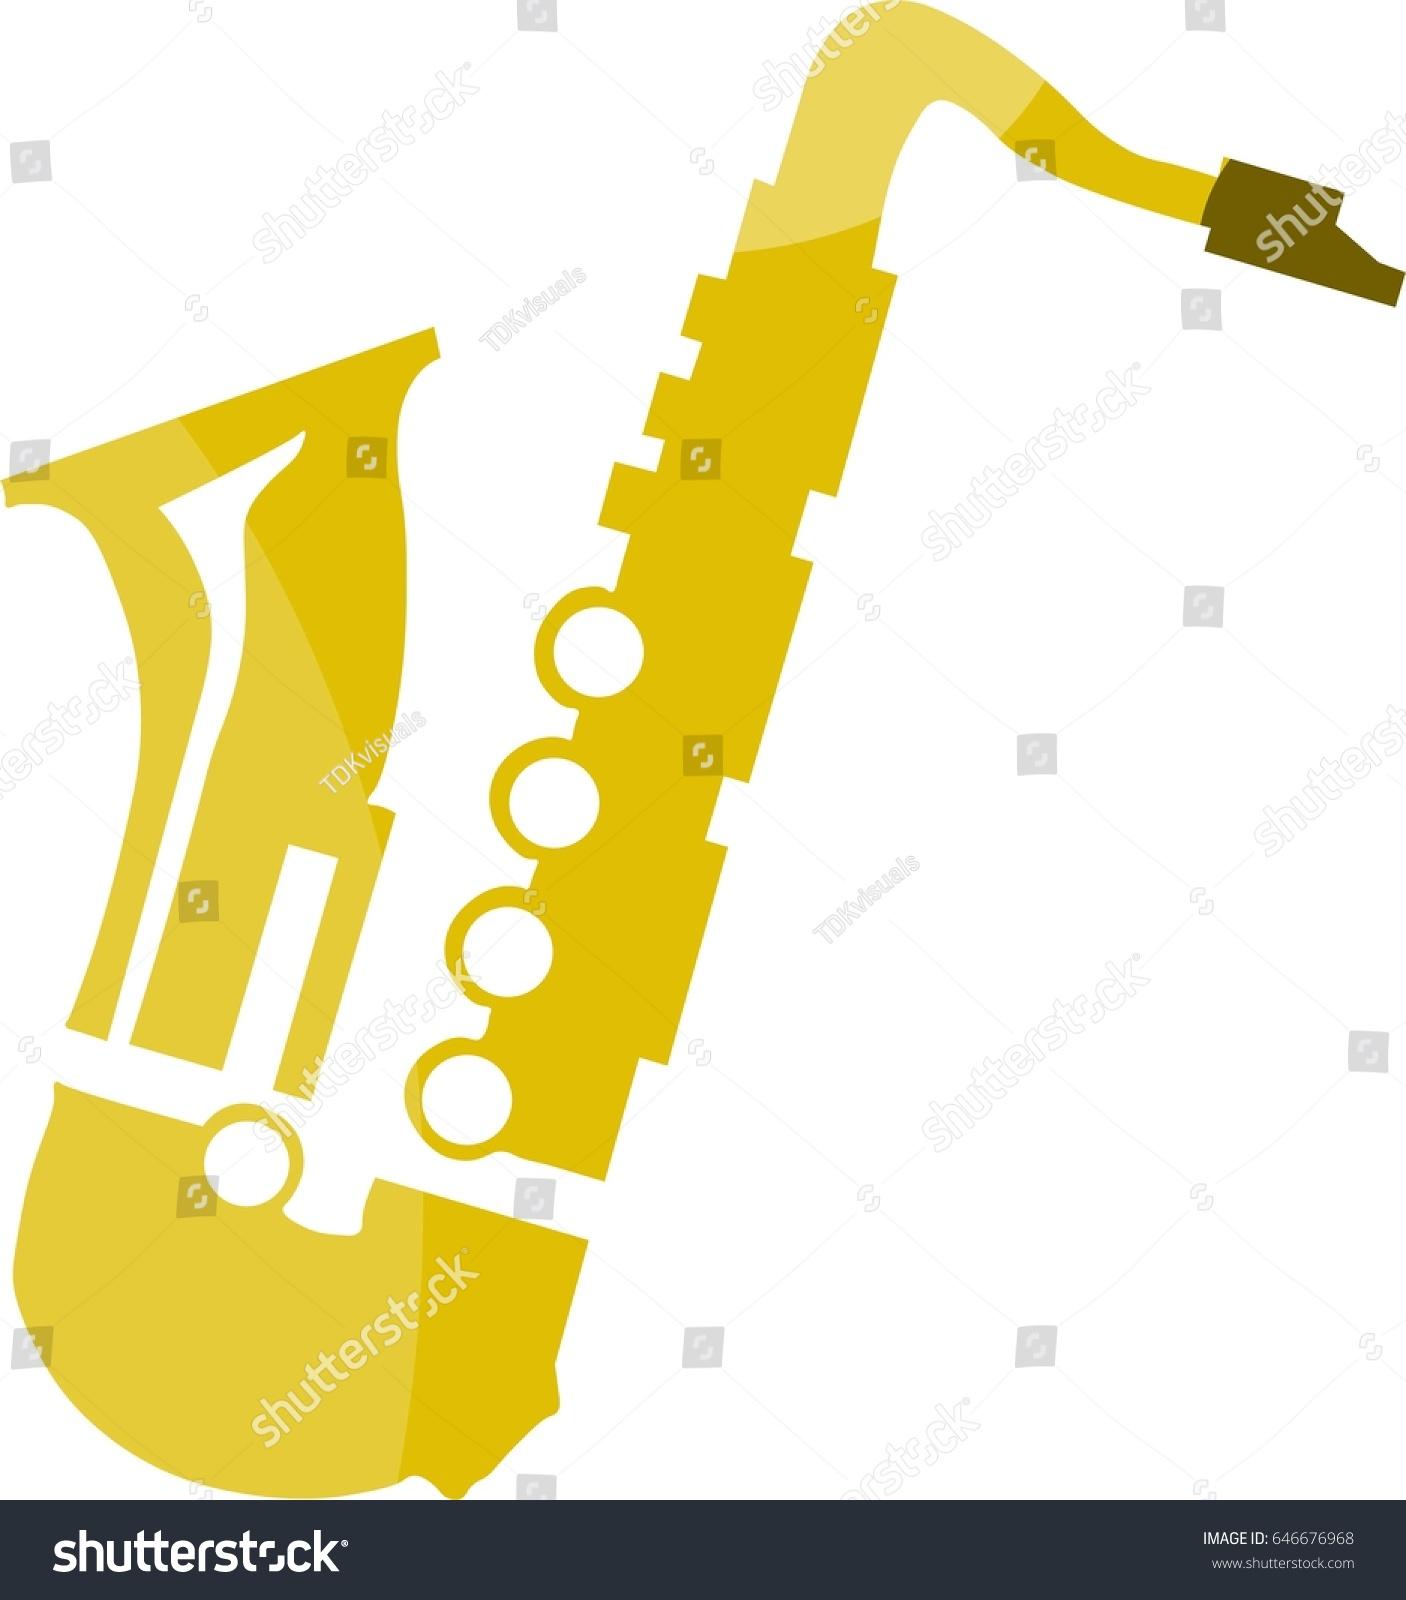 clipart saxophone stock vector 646676968 shutterstock rh shutterstock com saxophone clipart vector saxophone clip art free